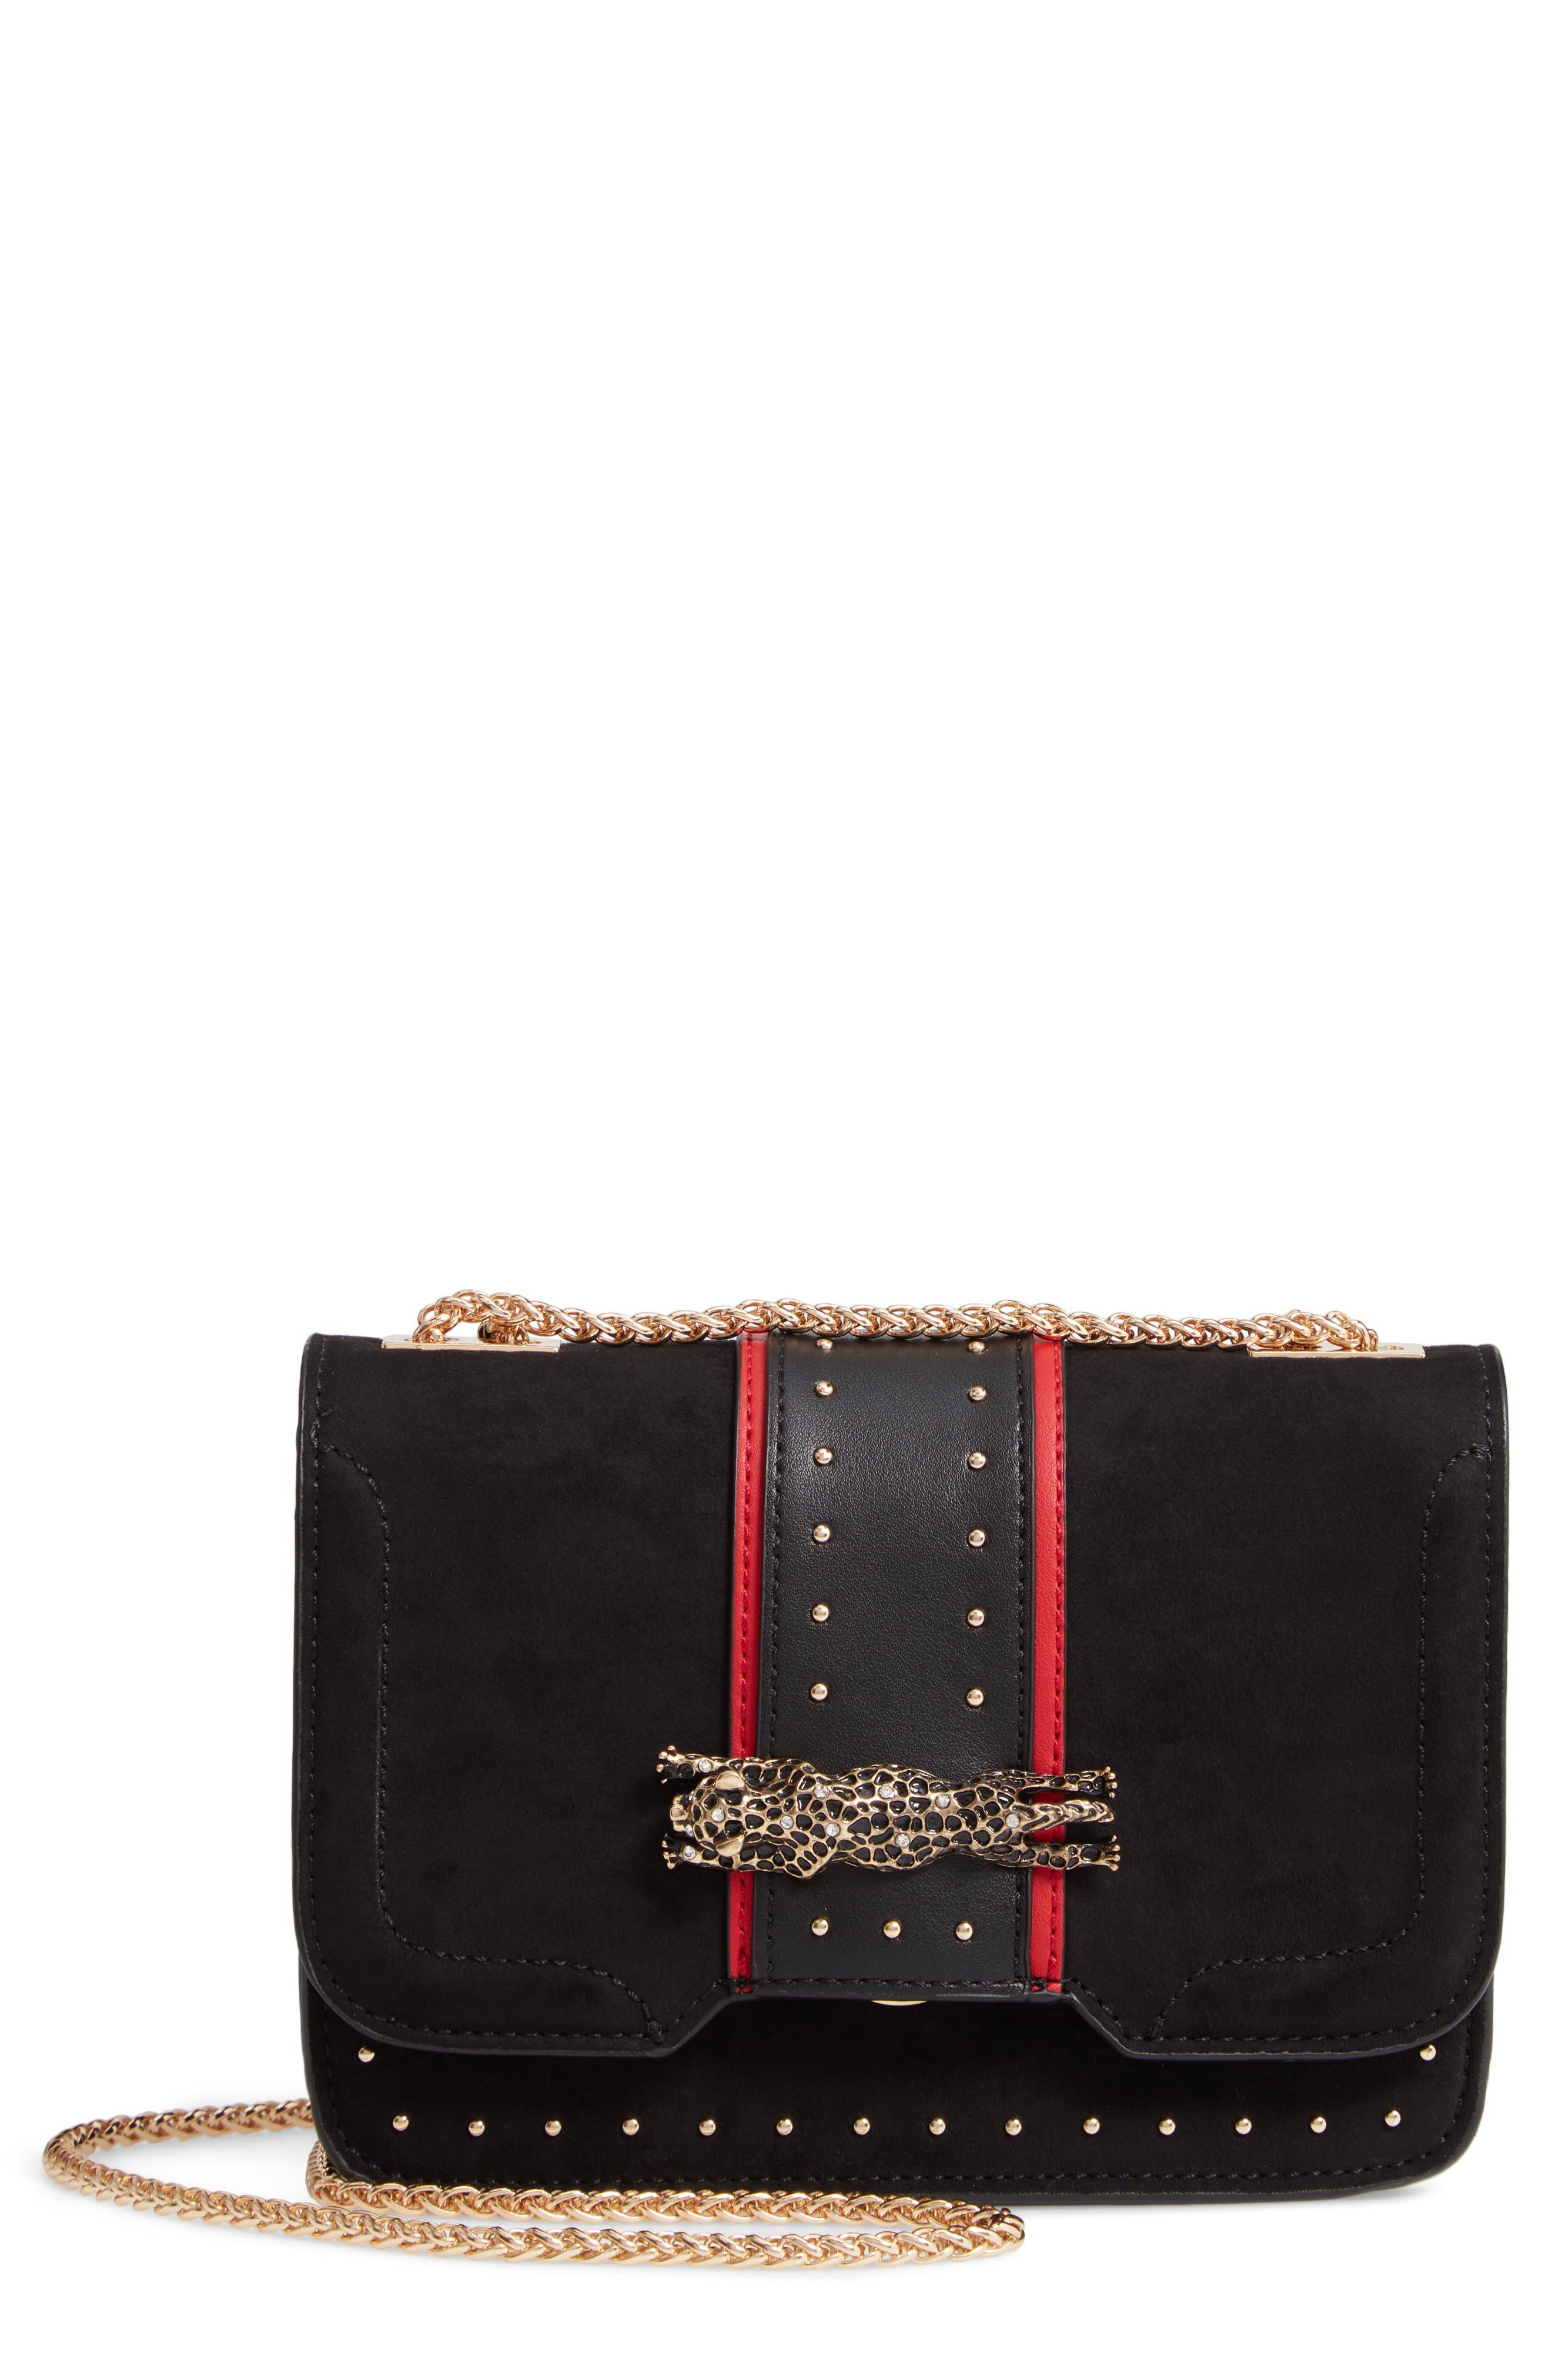 Panther Crossbody Bag,                         Main,                         color, BLACK